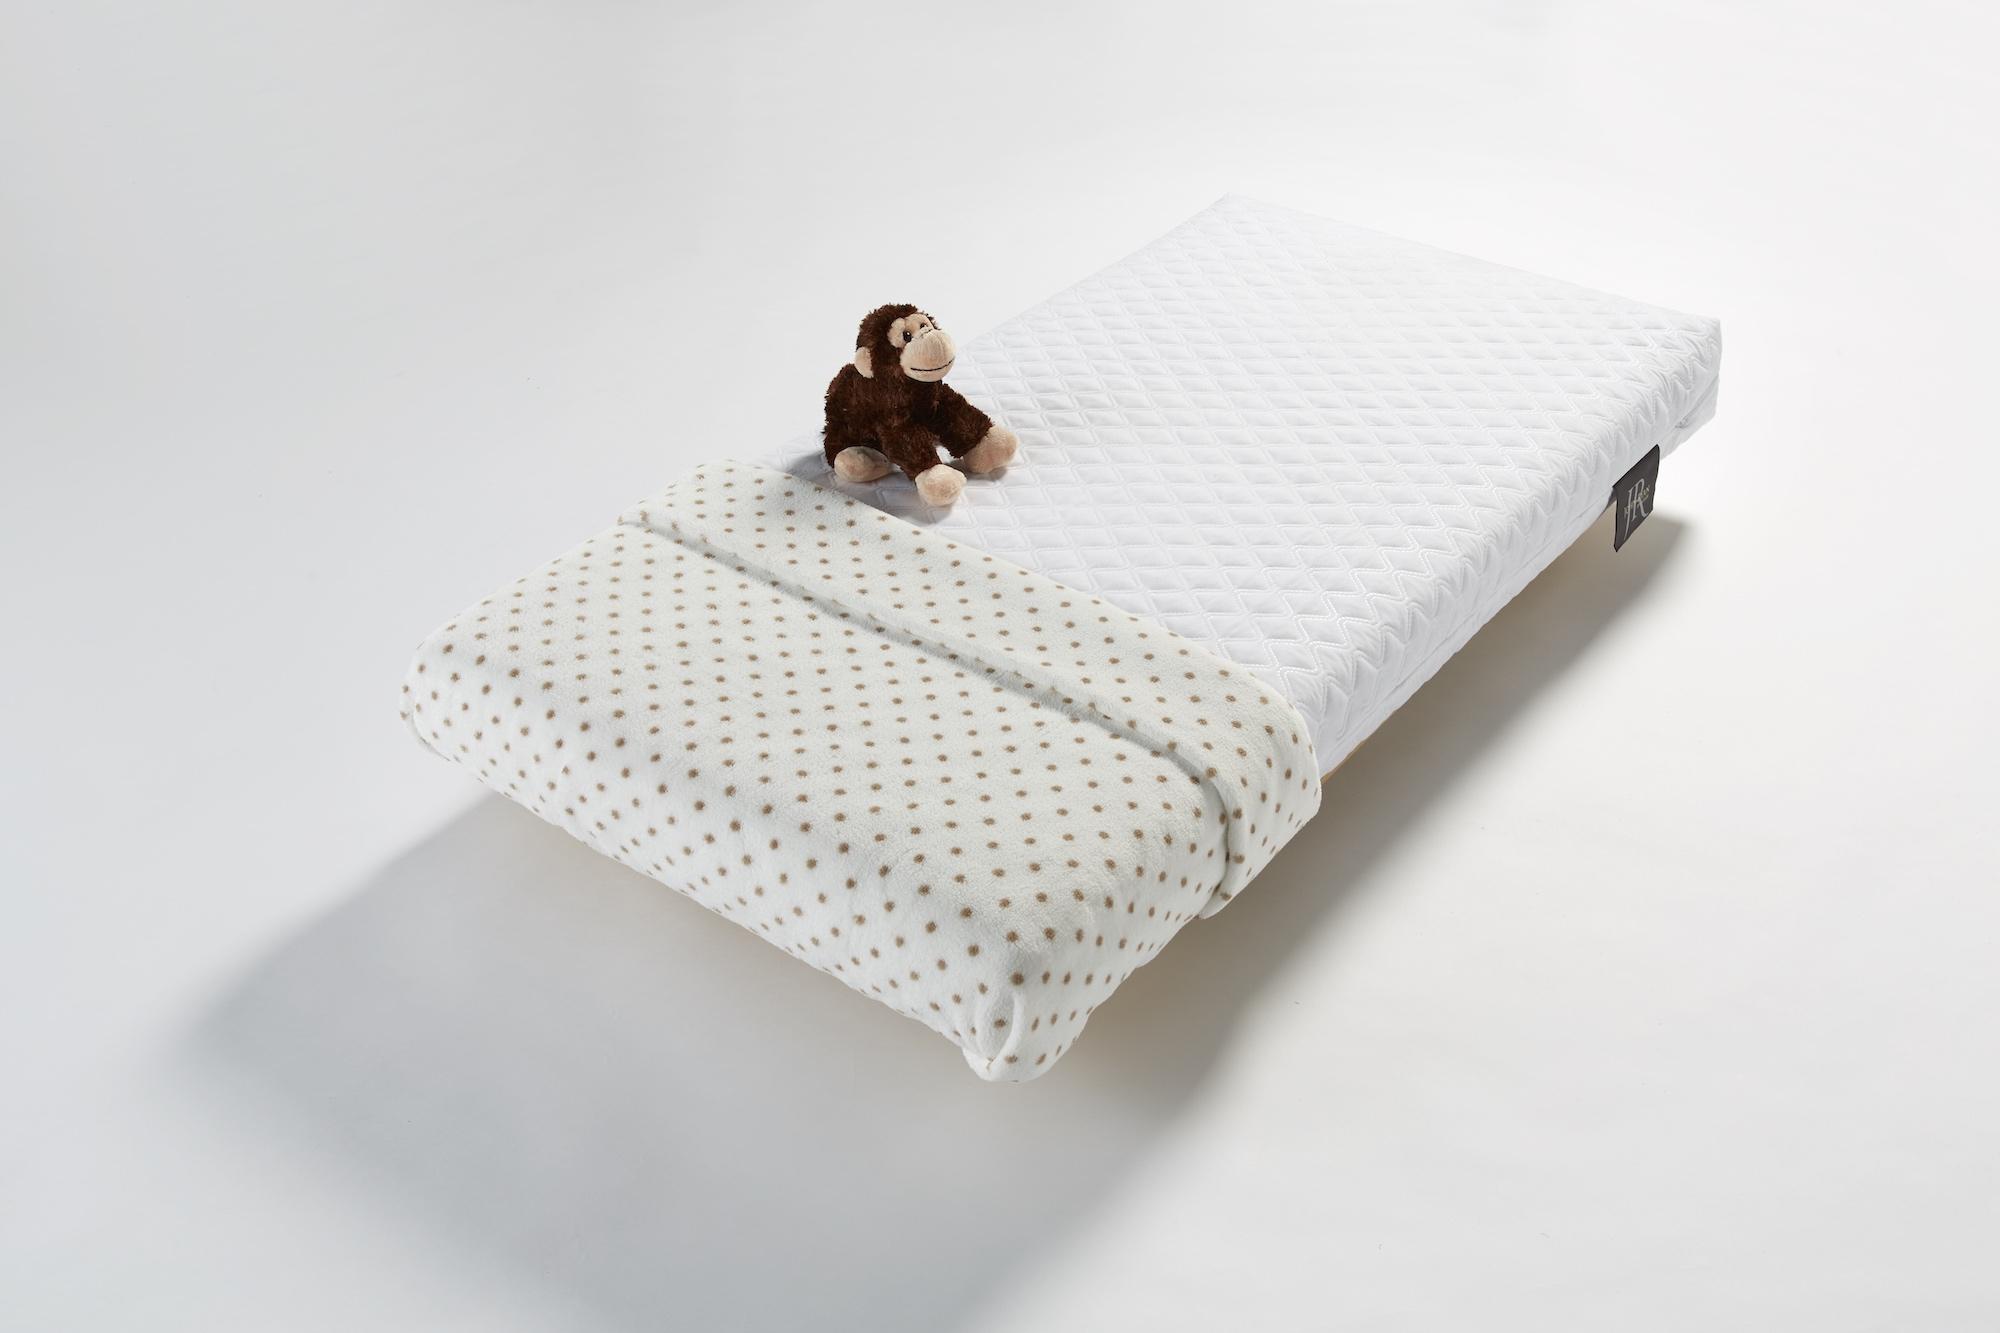 Cot Mattress Safety John Ryan By Design Mattress Amp Bed Specialists